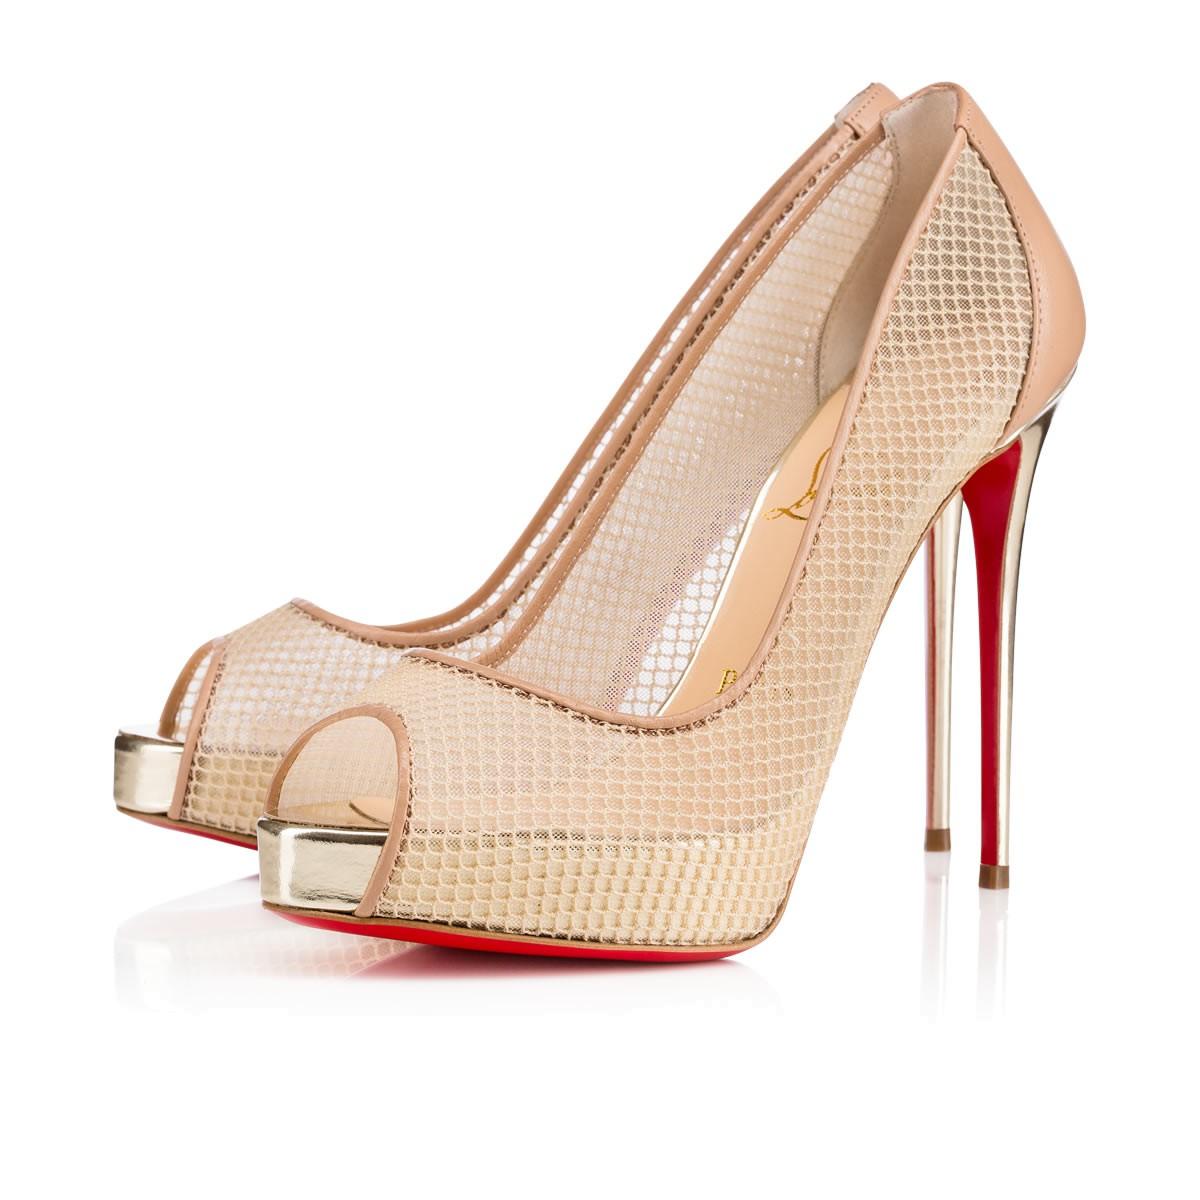 Christian Louboutin Very Rete Mesh Peep Toe Pumps Cl Shoes